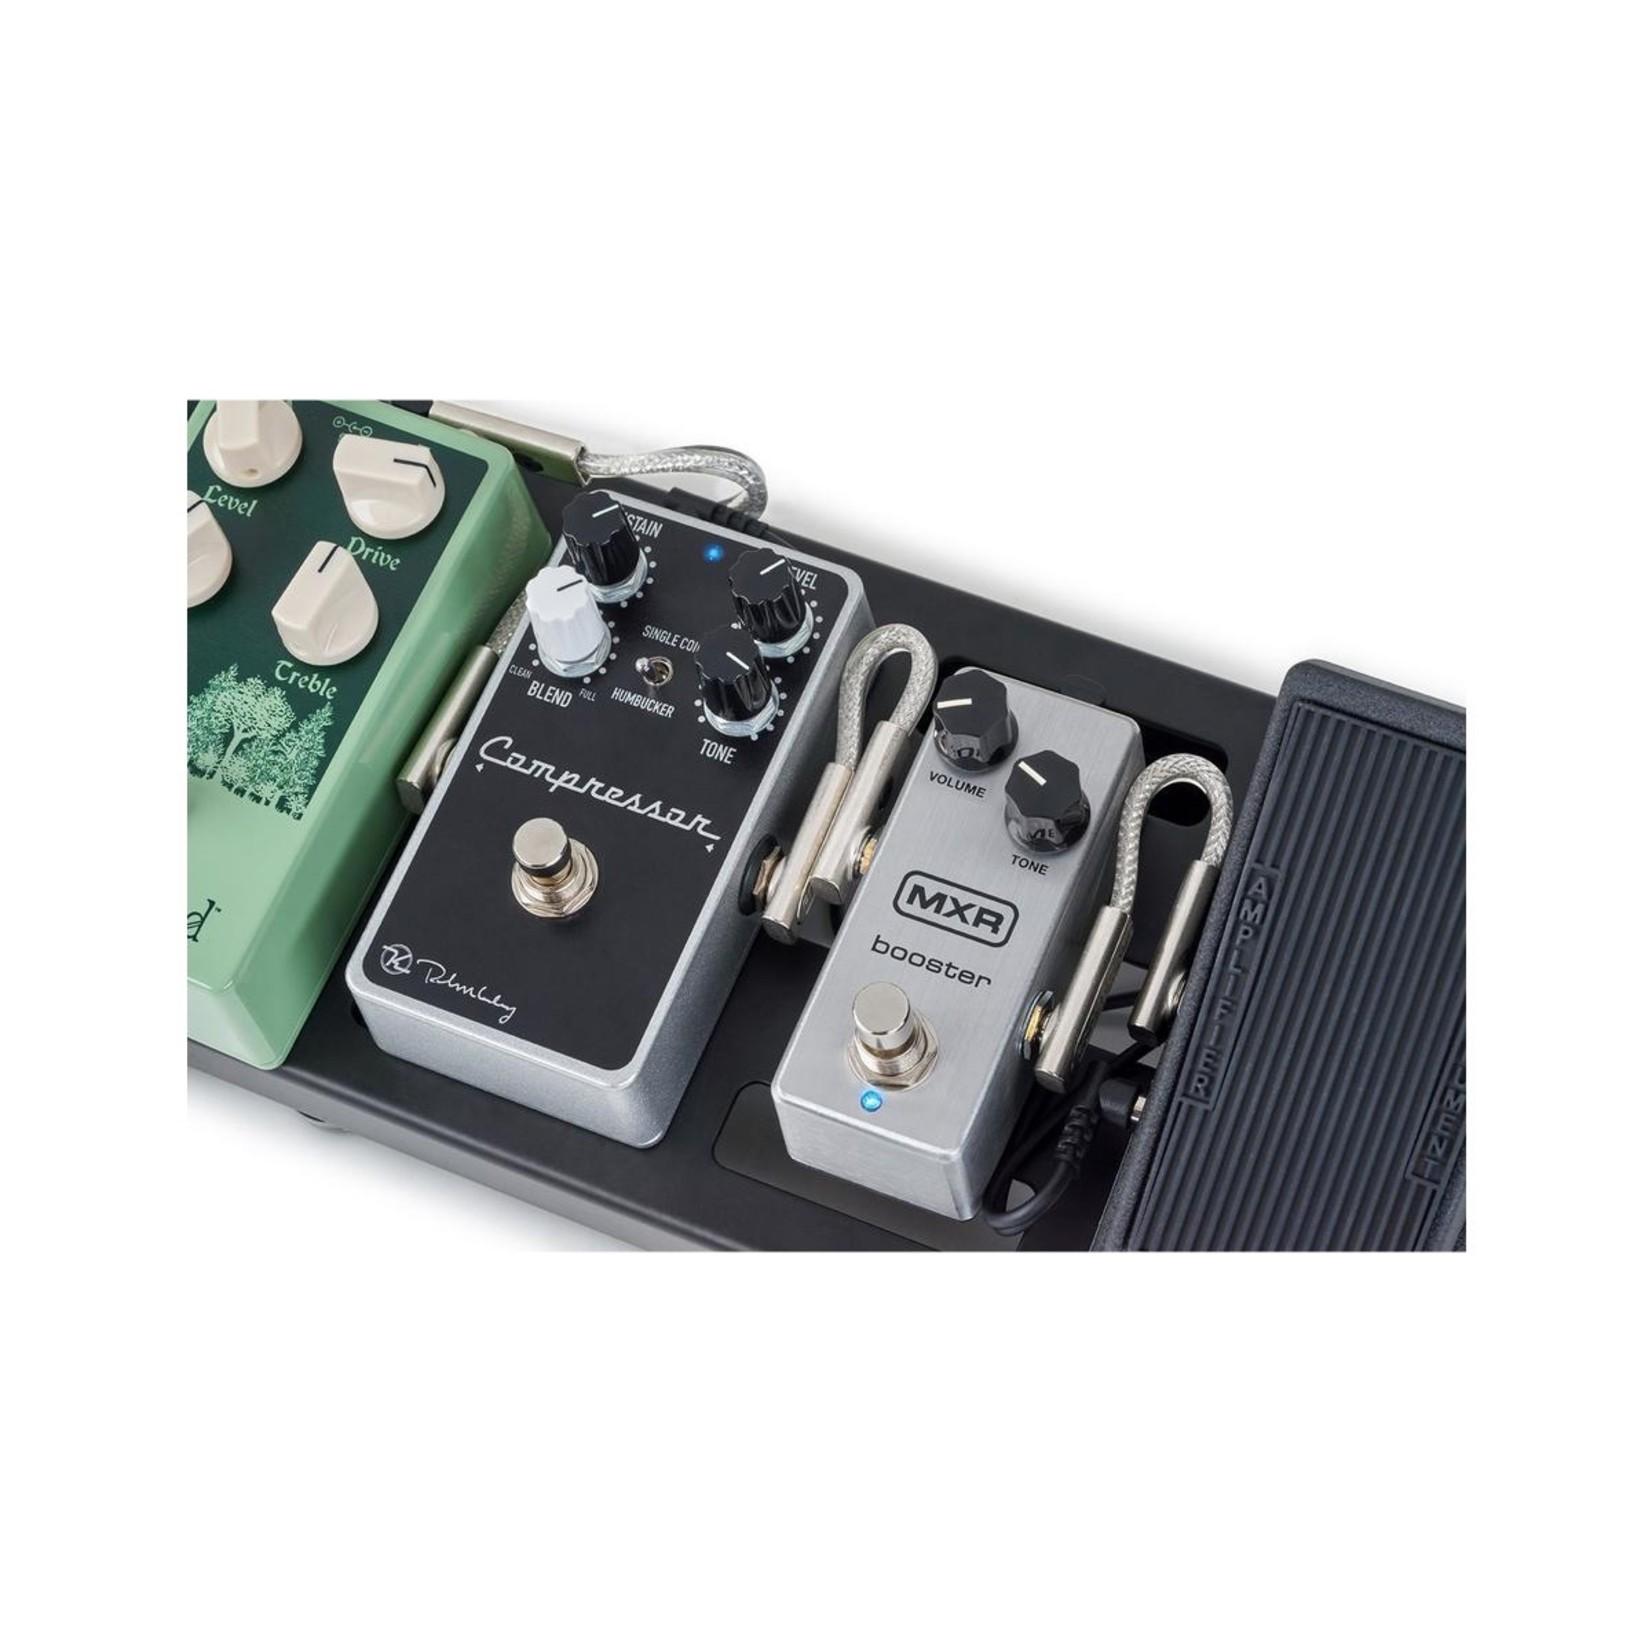 "Rockboard RockBoard Flat Patch Cable - Sapphire Series, 10 cm (3 15/16"")"